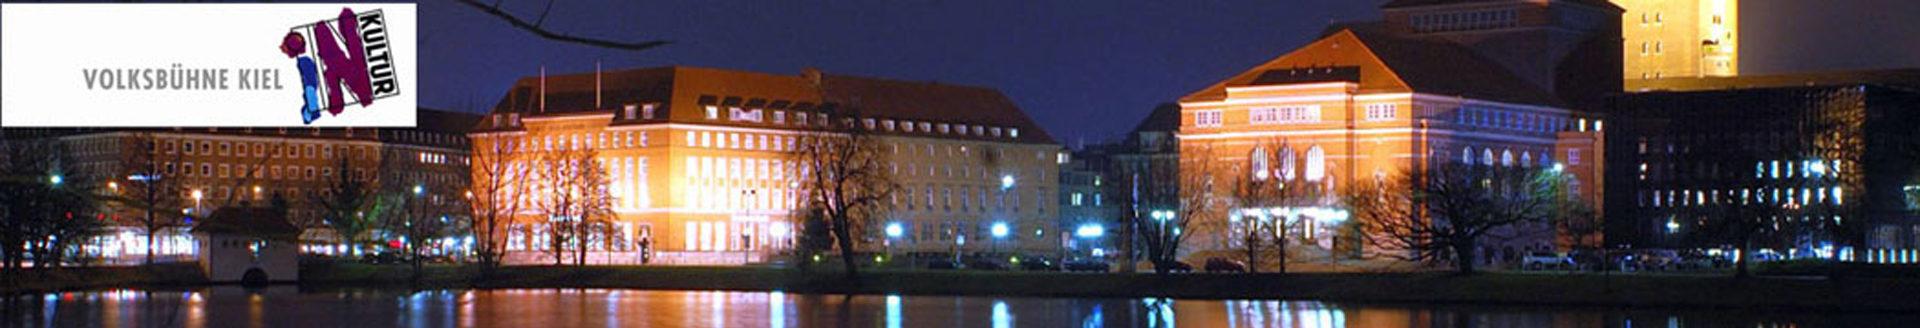 Volksbuehne Kiel e.V.